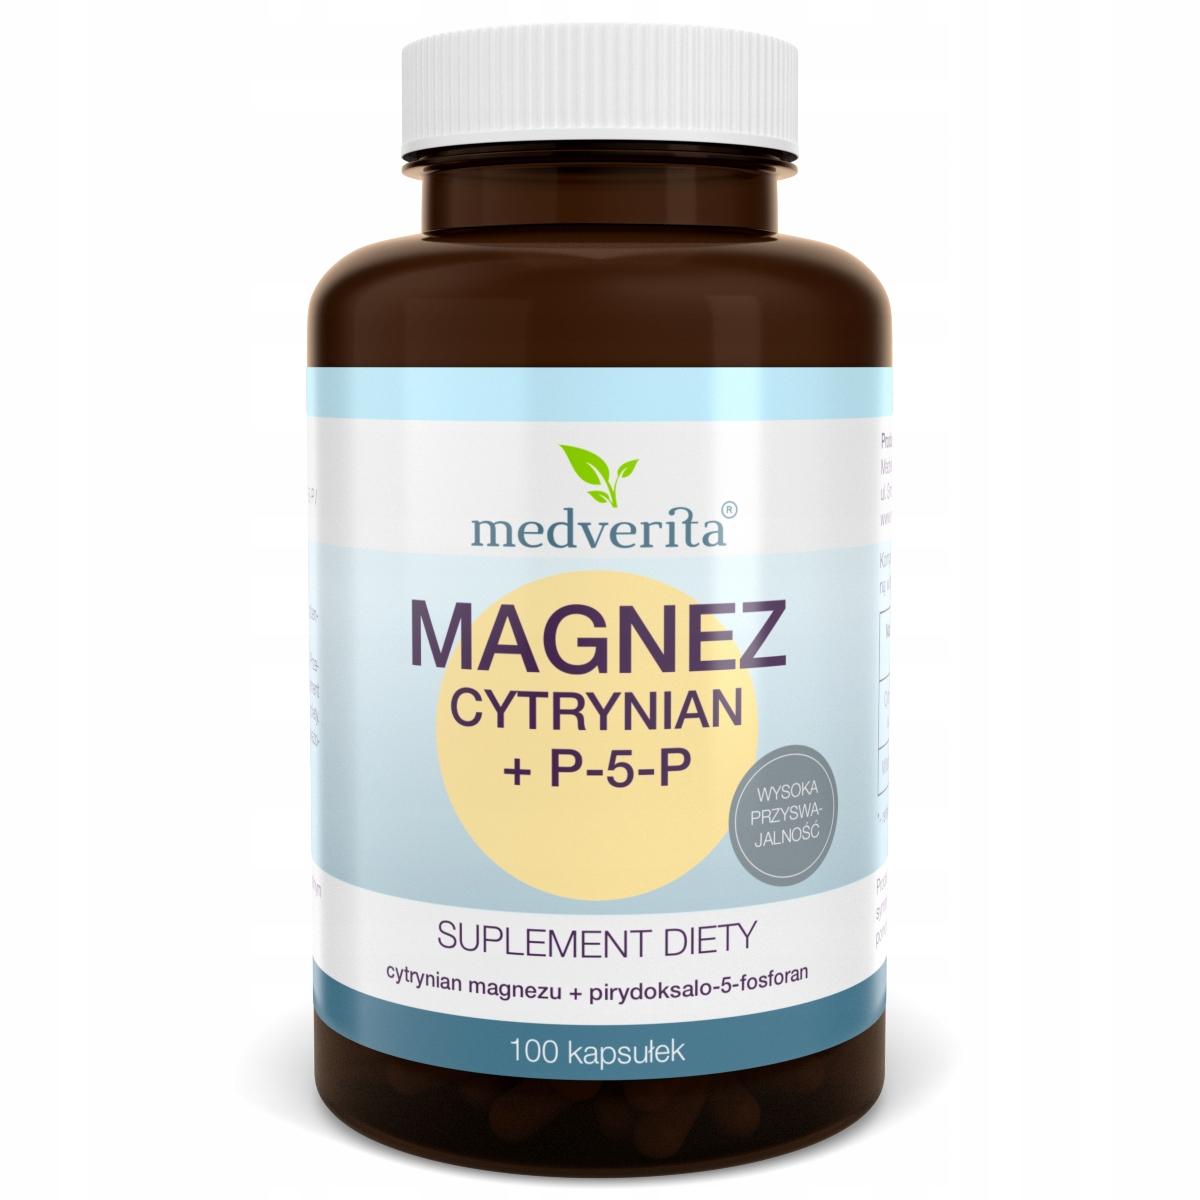 Magnez cytrynian magnezu + P-5-P B6 - 100 kapsułek